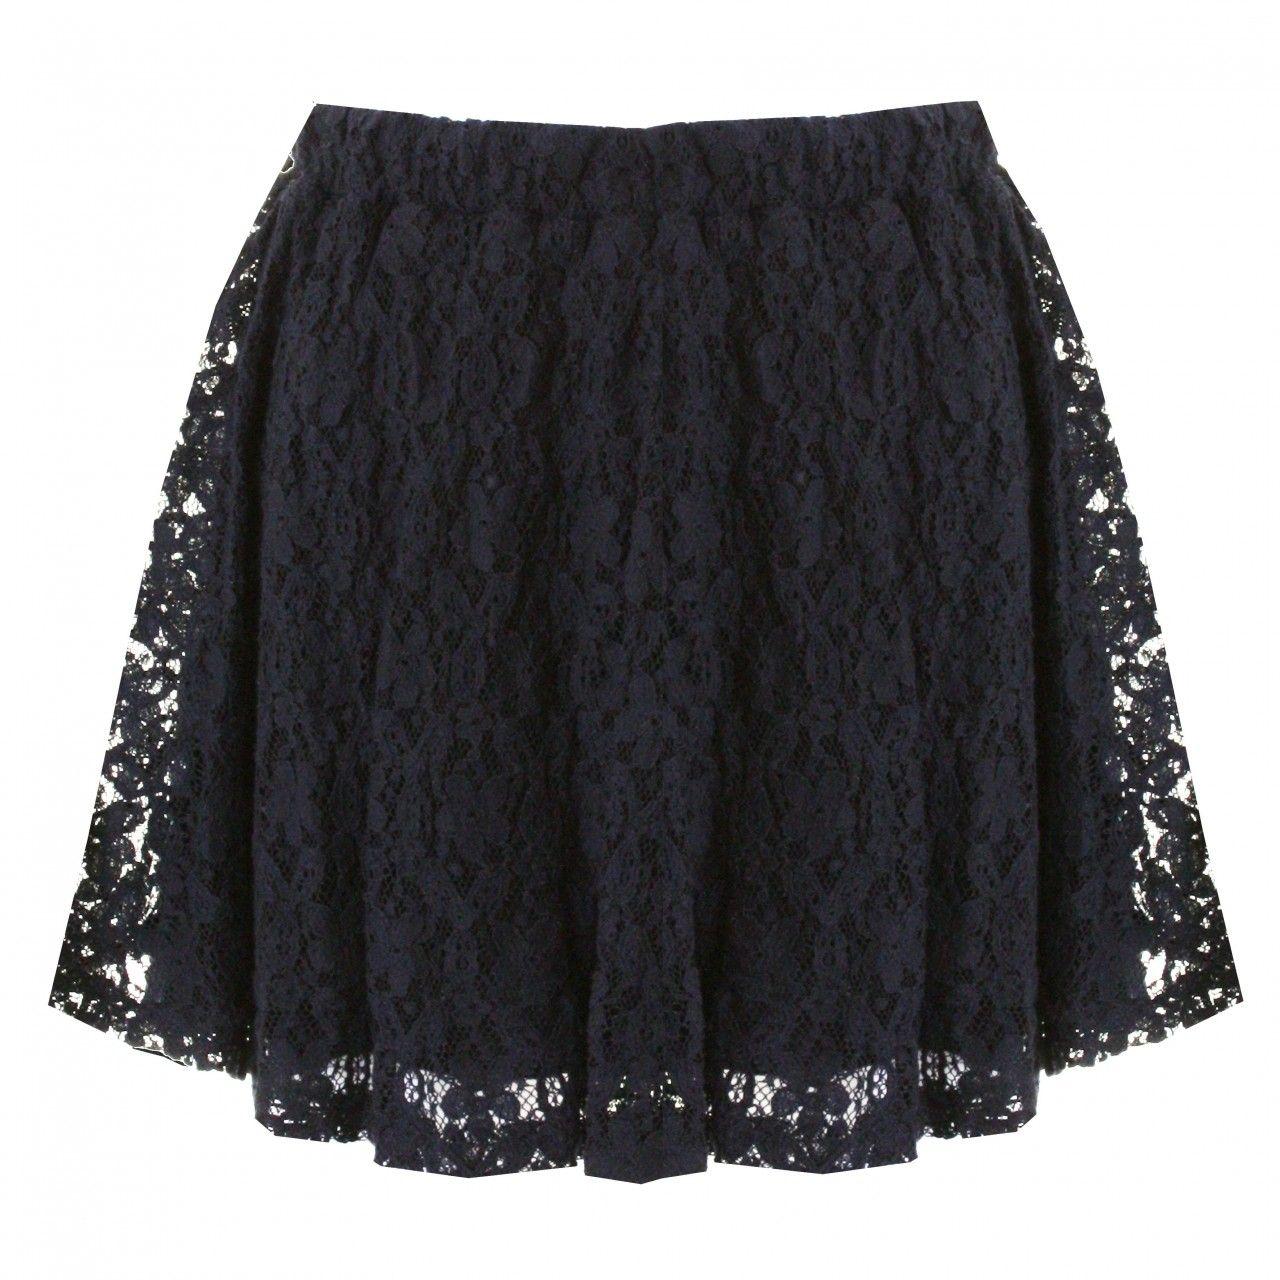 LOVE Navy Short Lace Skirt